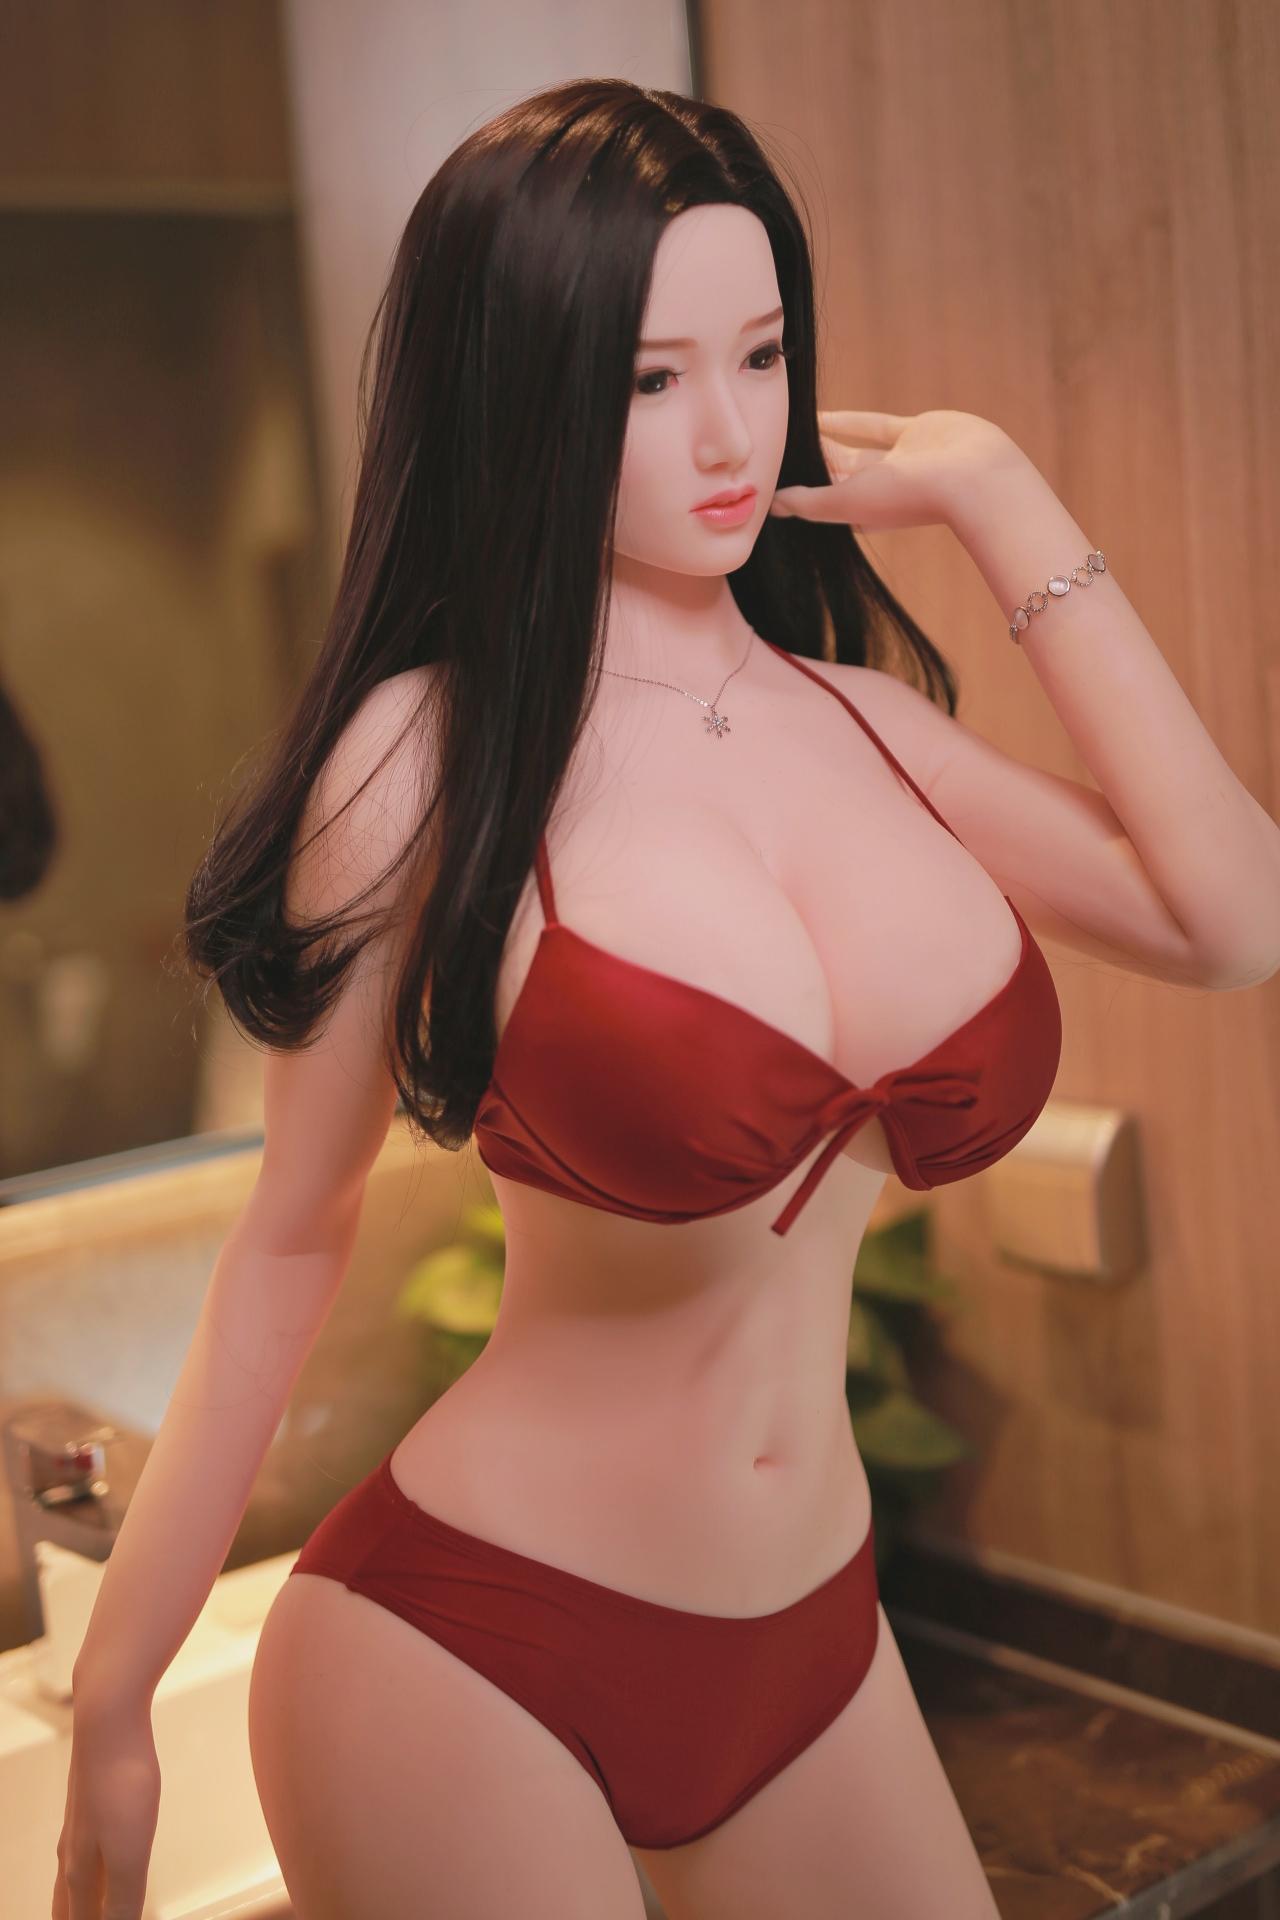 Levně Love Doll Asiatka Meri, 170 cm/ H-Cup